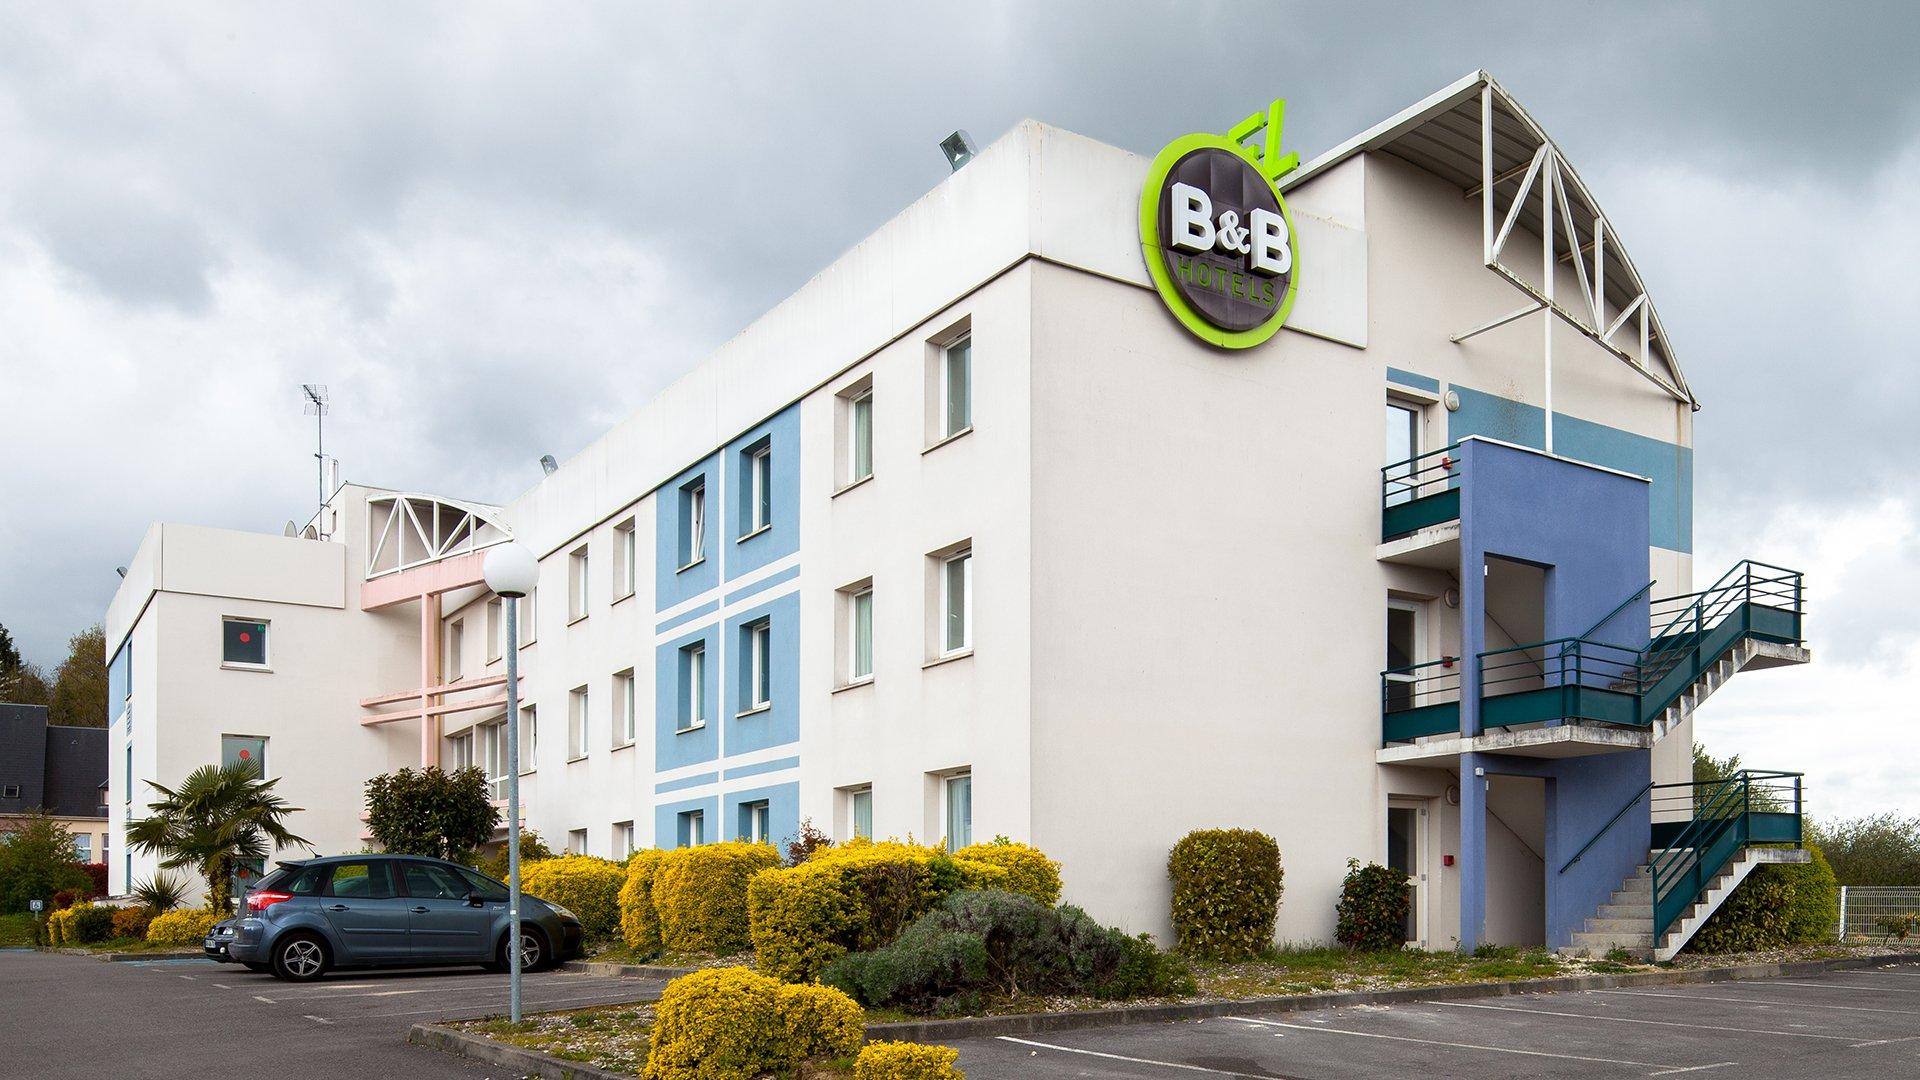 B&B Hôtel Beauvais